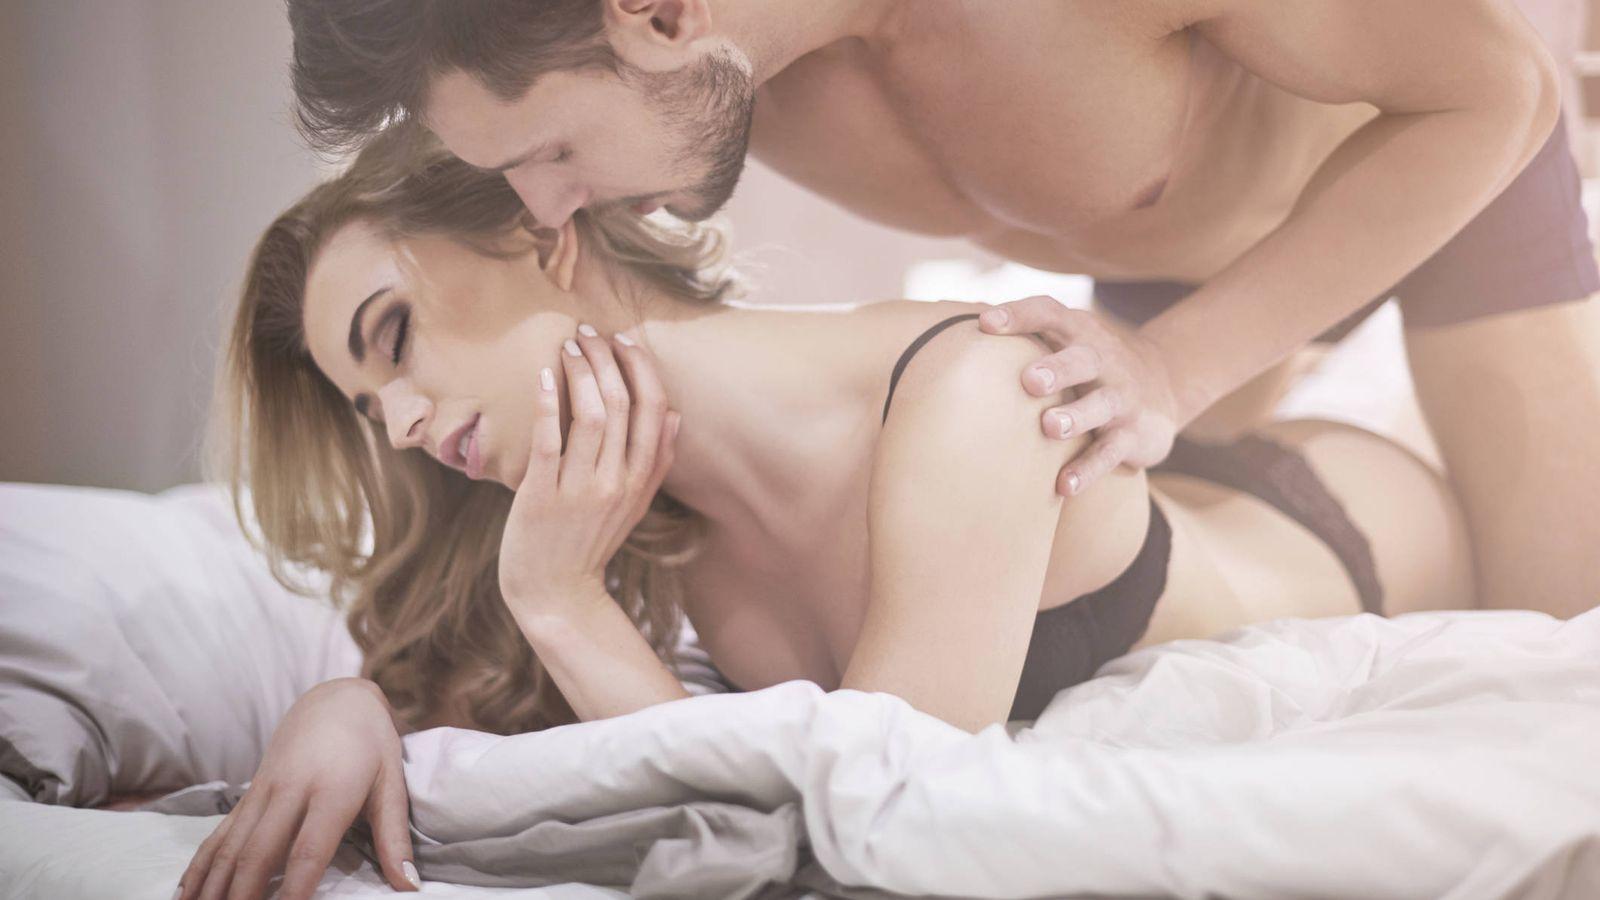 Quien disfruta mas al hacer el amor [PUNIQRANDLINE-(au-dating-names.txt) 56